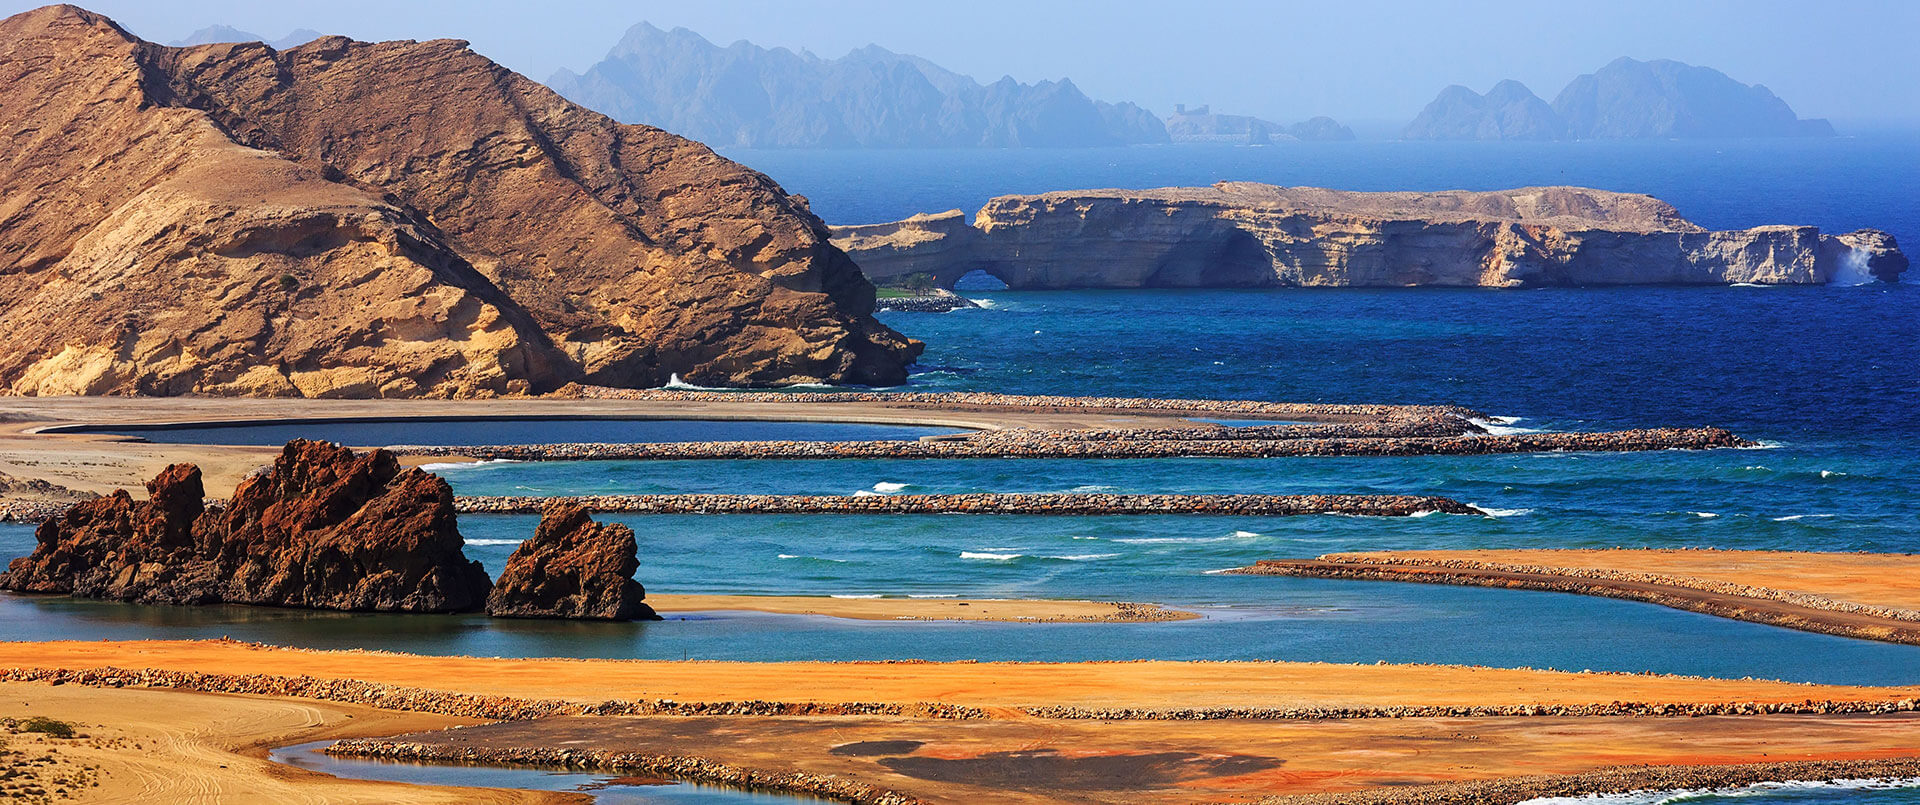 Oman Explorer